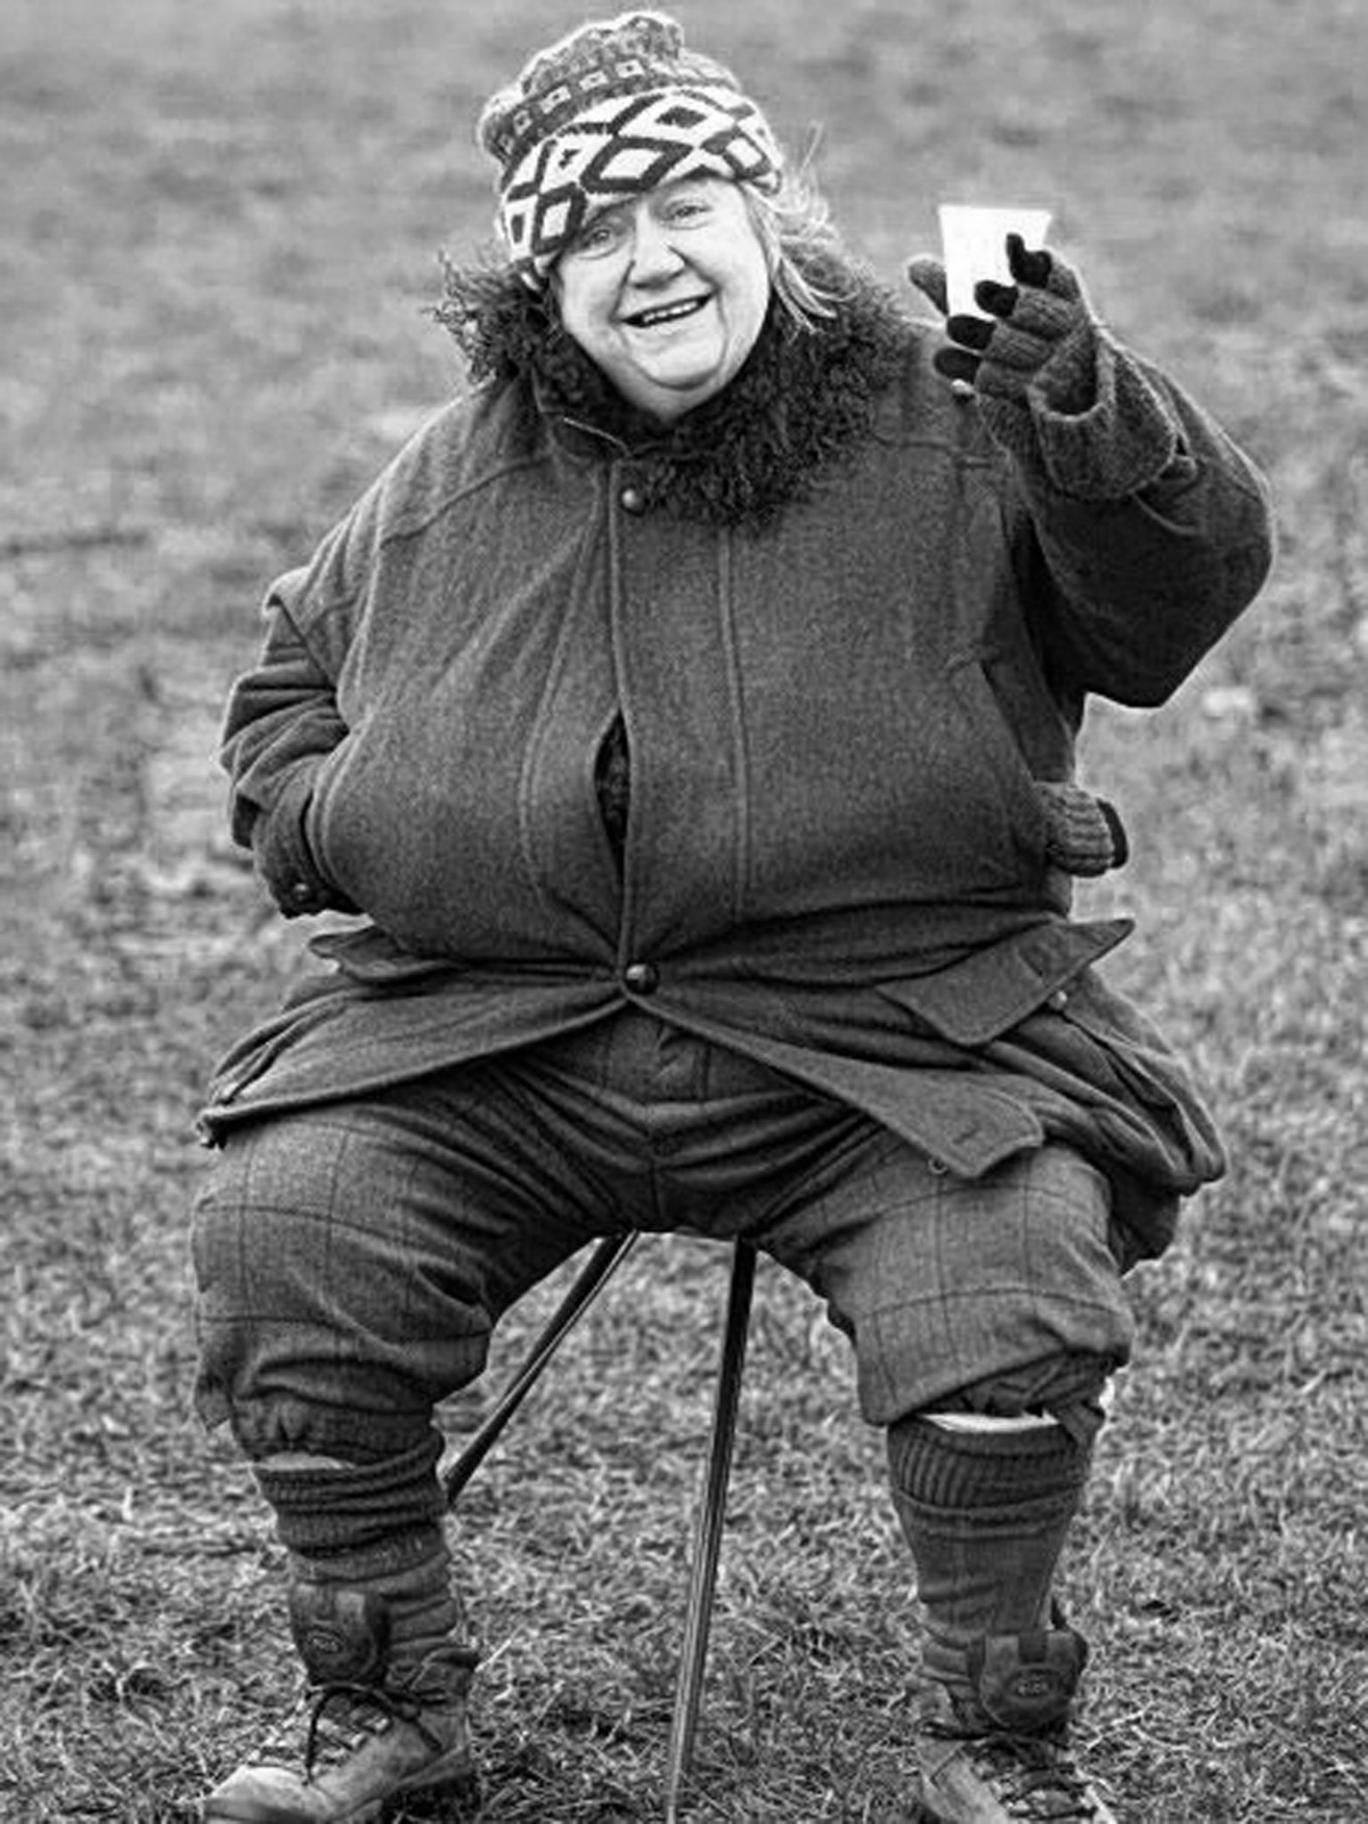 Dickson Wright in 2004: she was known as 'Krakatoa' to film crews